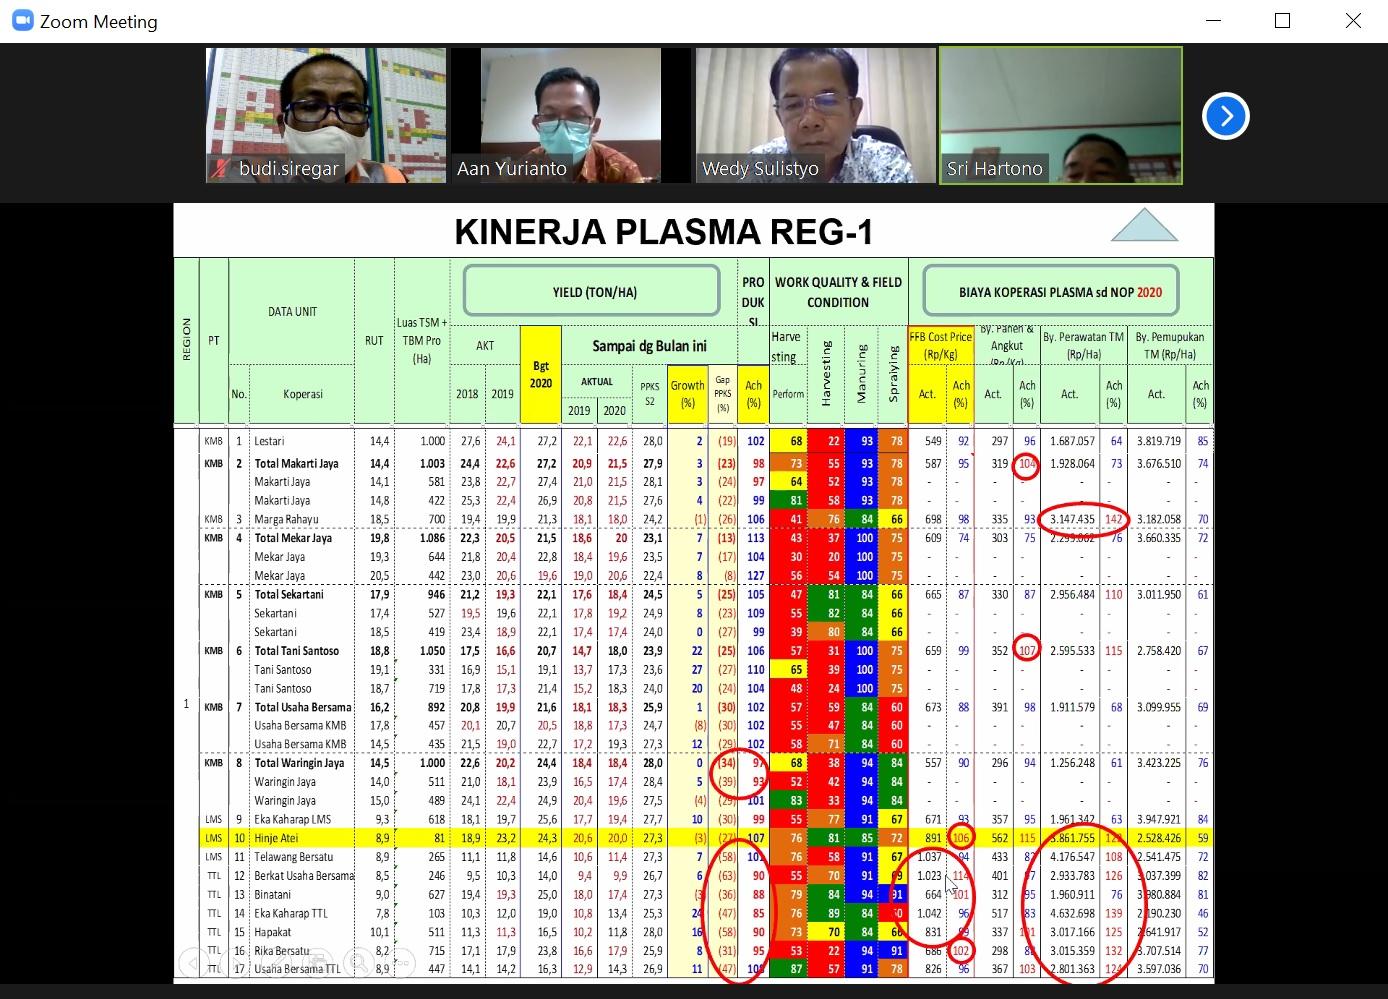 Kinerja Plasma Regional Mentaya, sd Nopember 2020